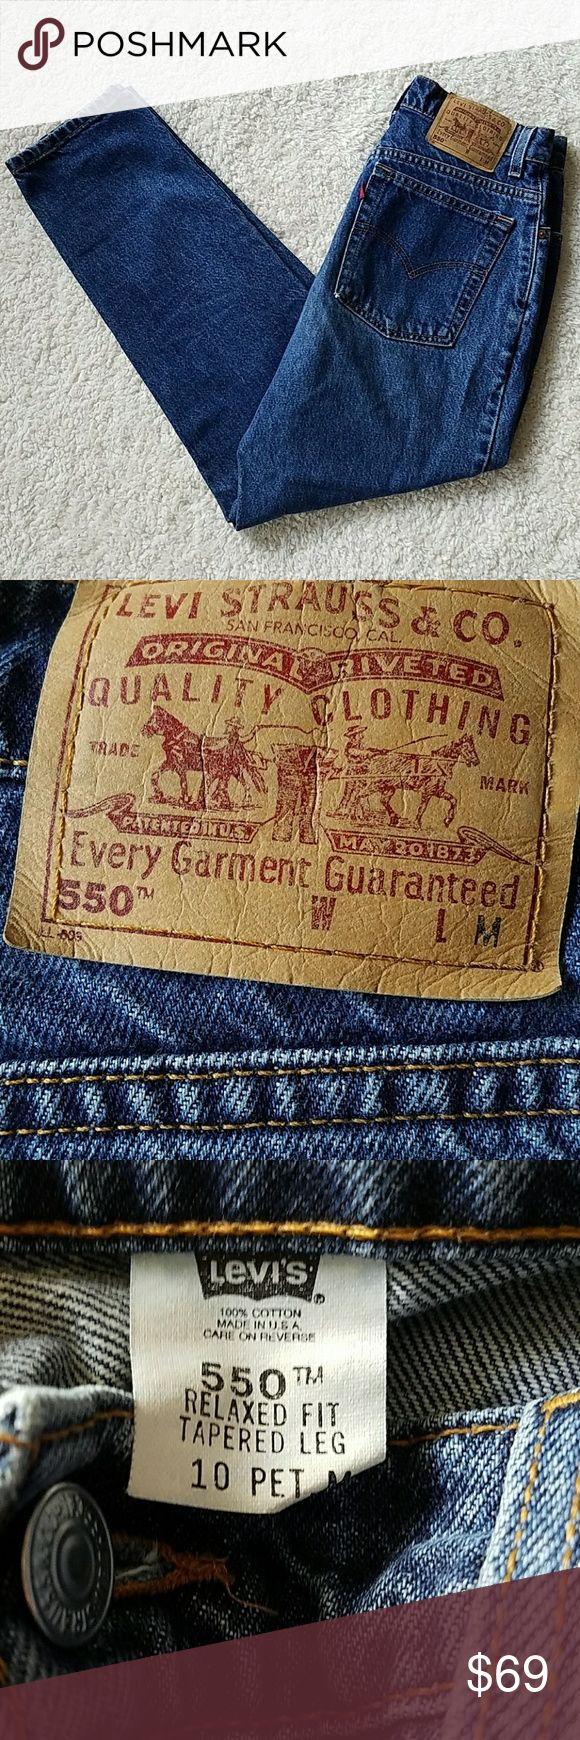 LEVI'S 550 BLUE JEANS LEVI 550 BLUE JEANS  TAGGED:10 PETITE~TAPERED LEG MEASURED: W28 L28 RISE:11 1/2HIPS:38 Levi's Jeans Straight Leg